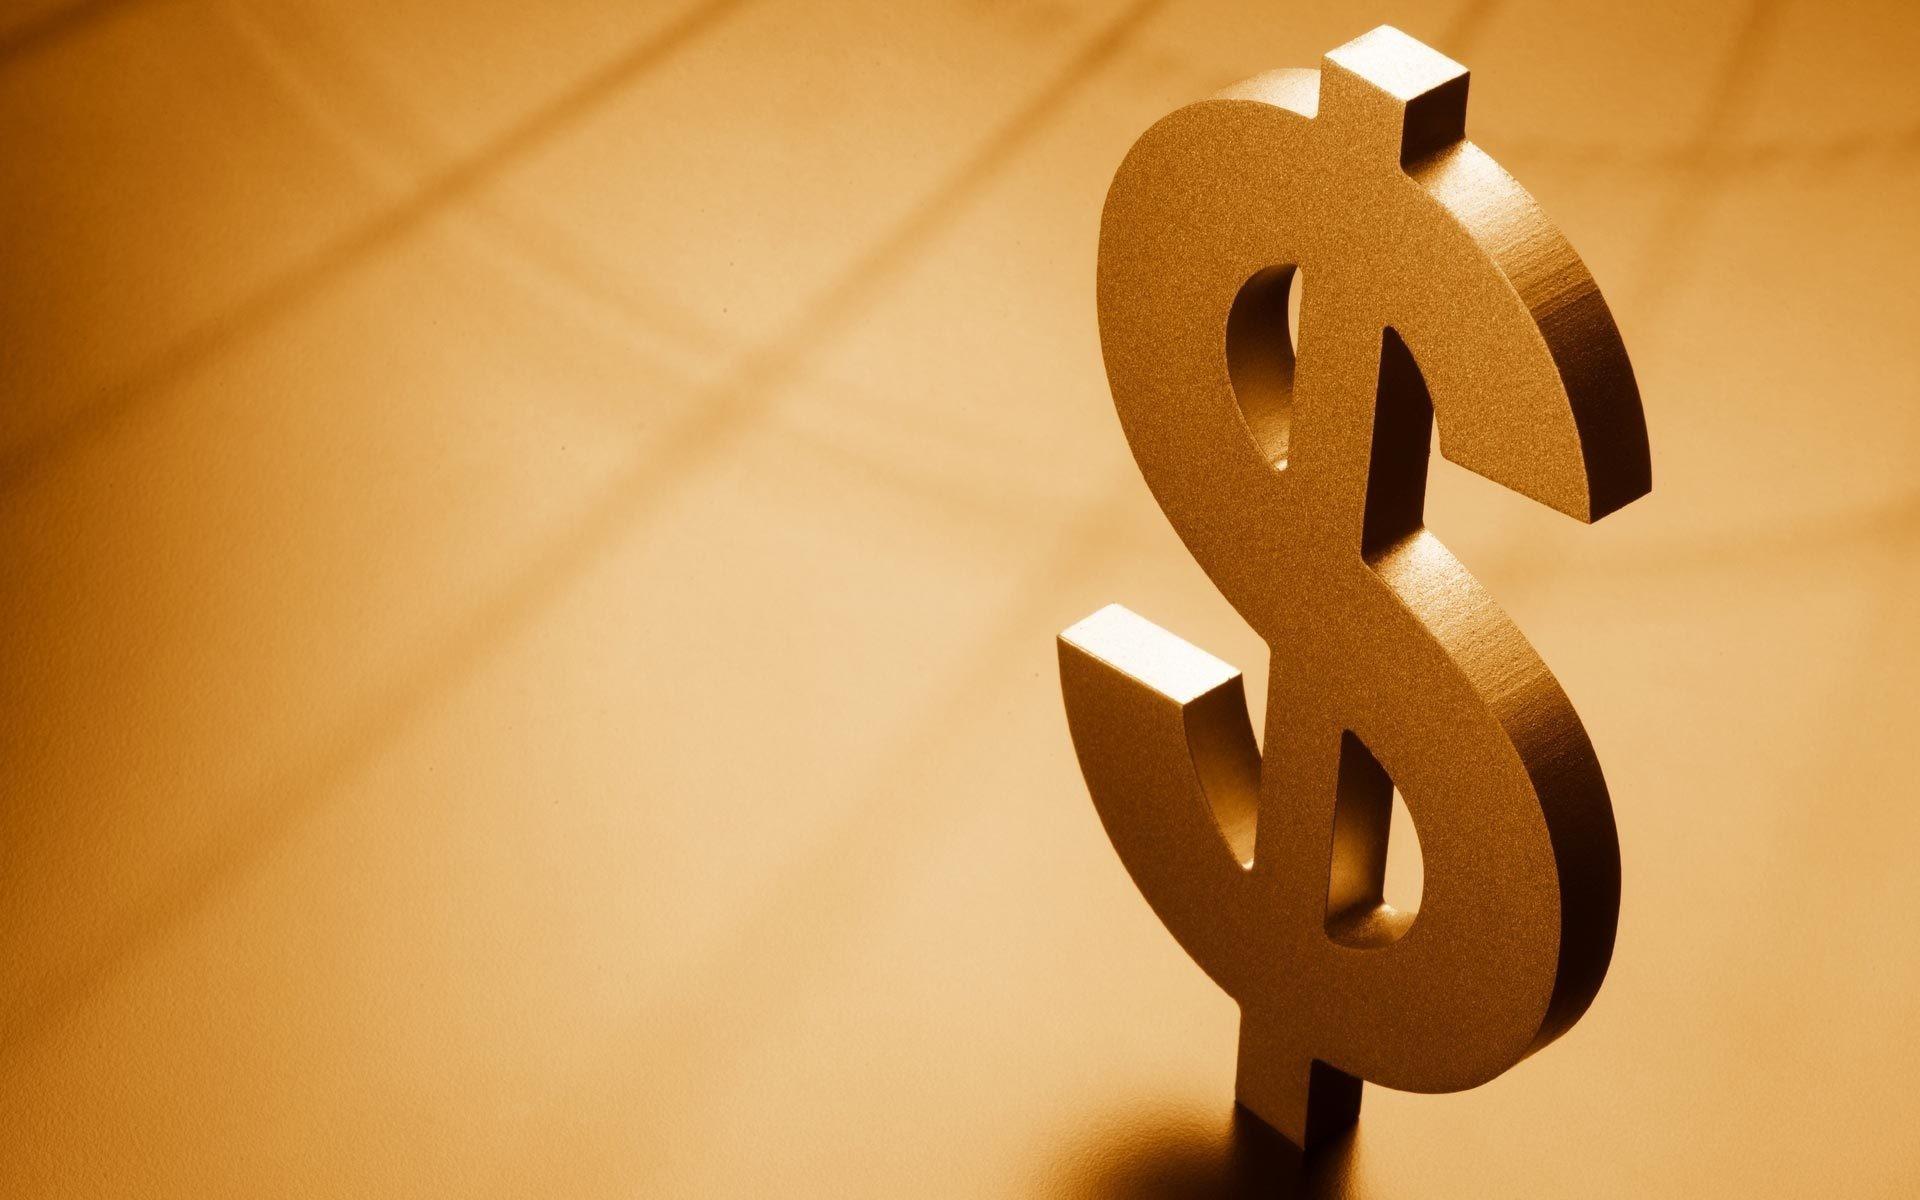 Dollar sign referral culture